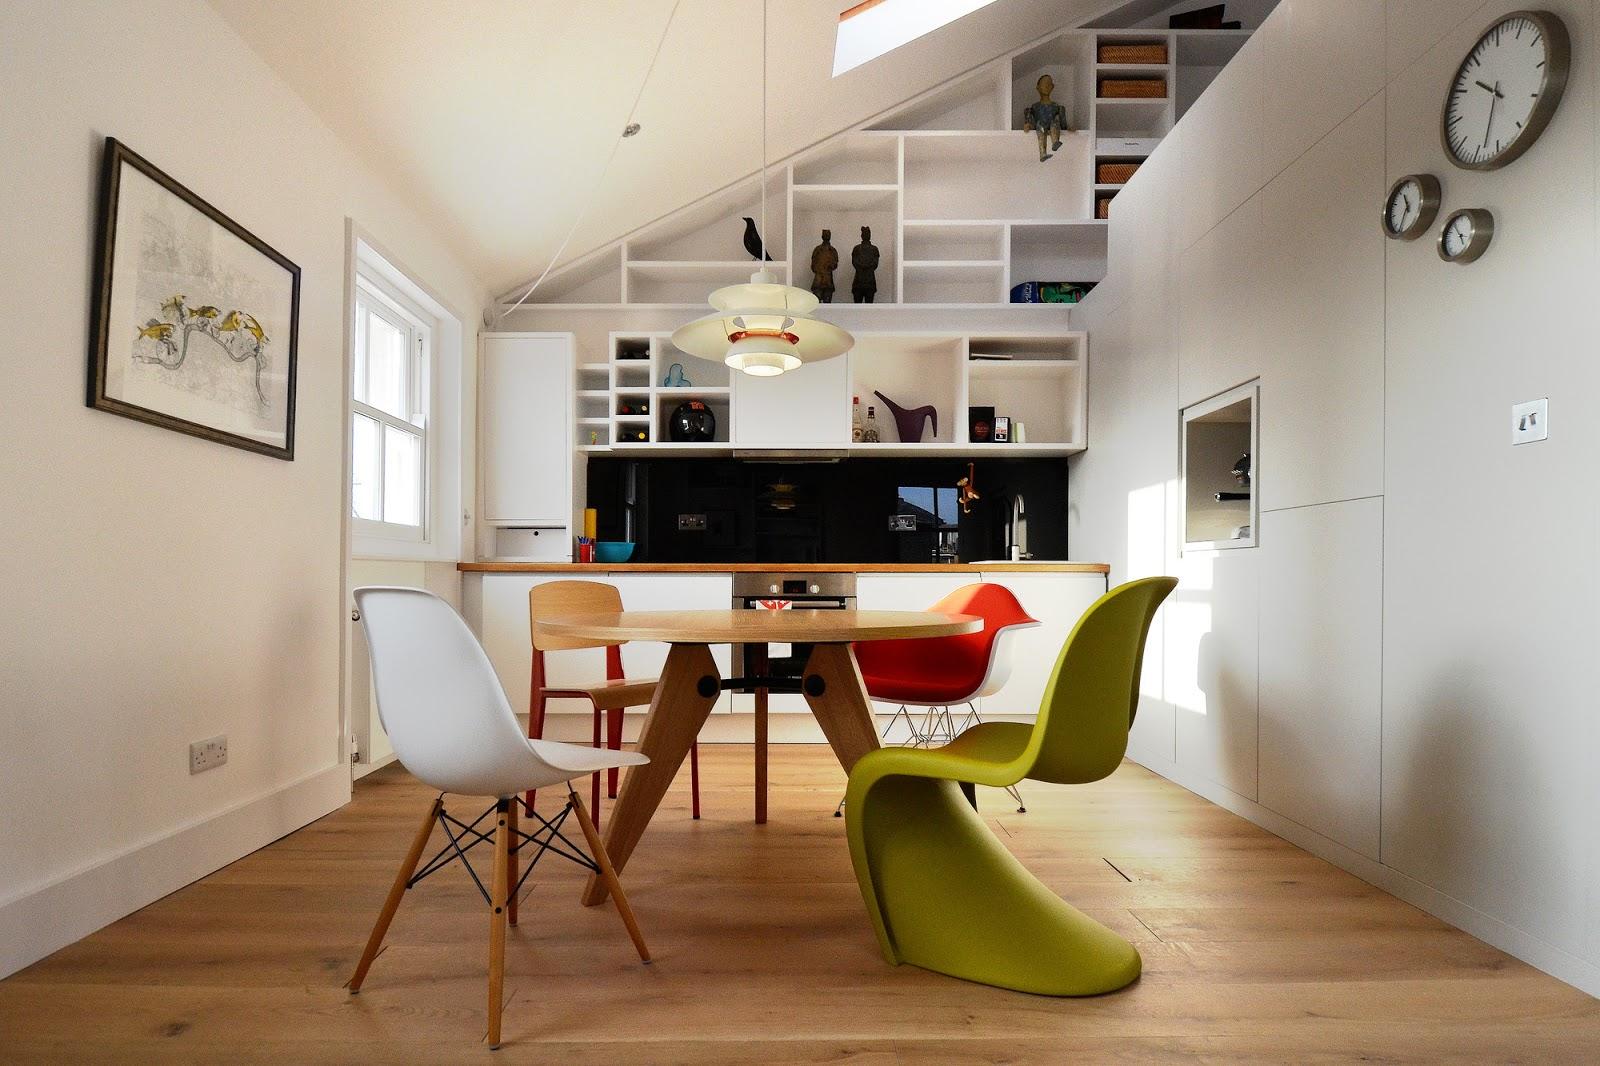 galleria_lakberendezes_space-saving-apartment009.jpg